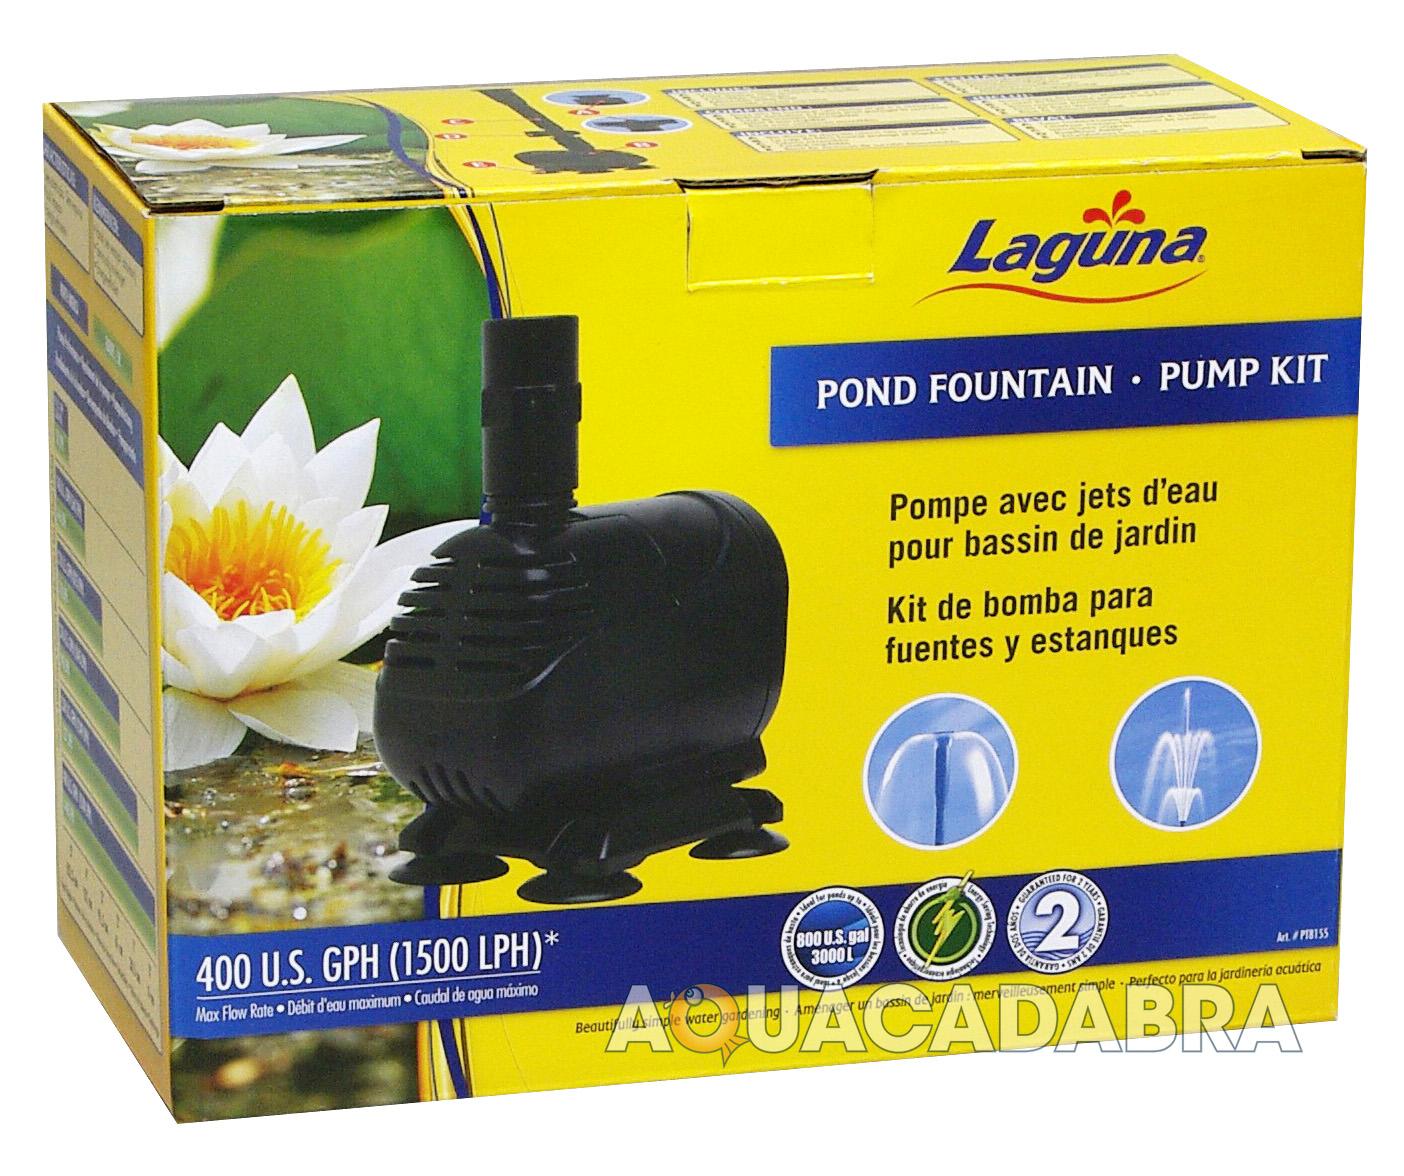 Laguna pond fountain pump kit 1500 lph garden goldfish for Goldfish pond kits